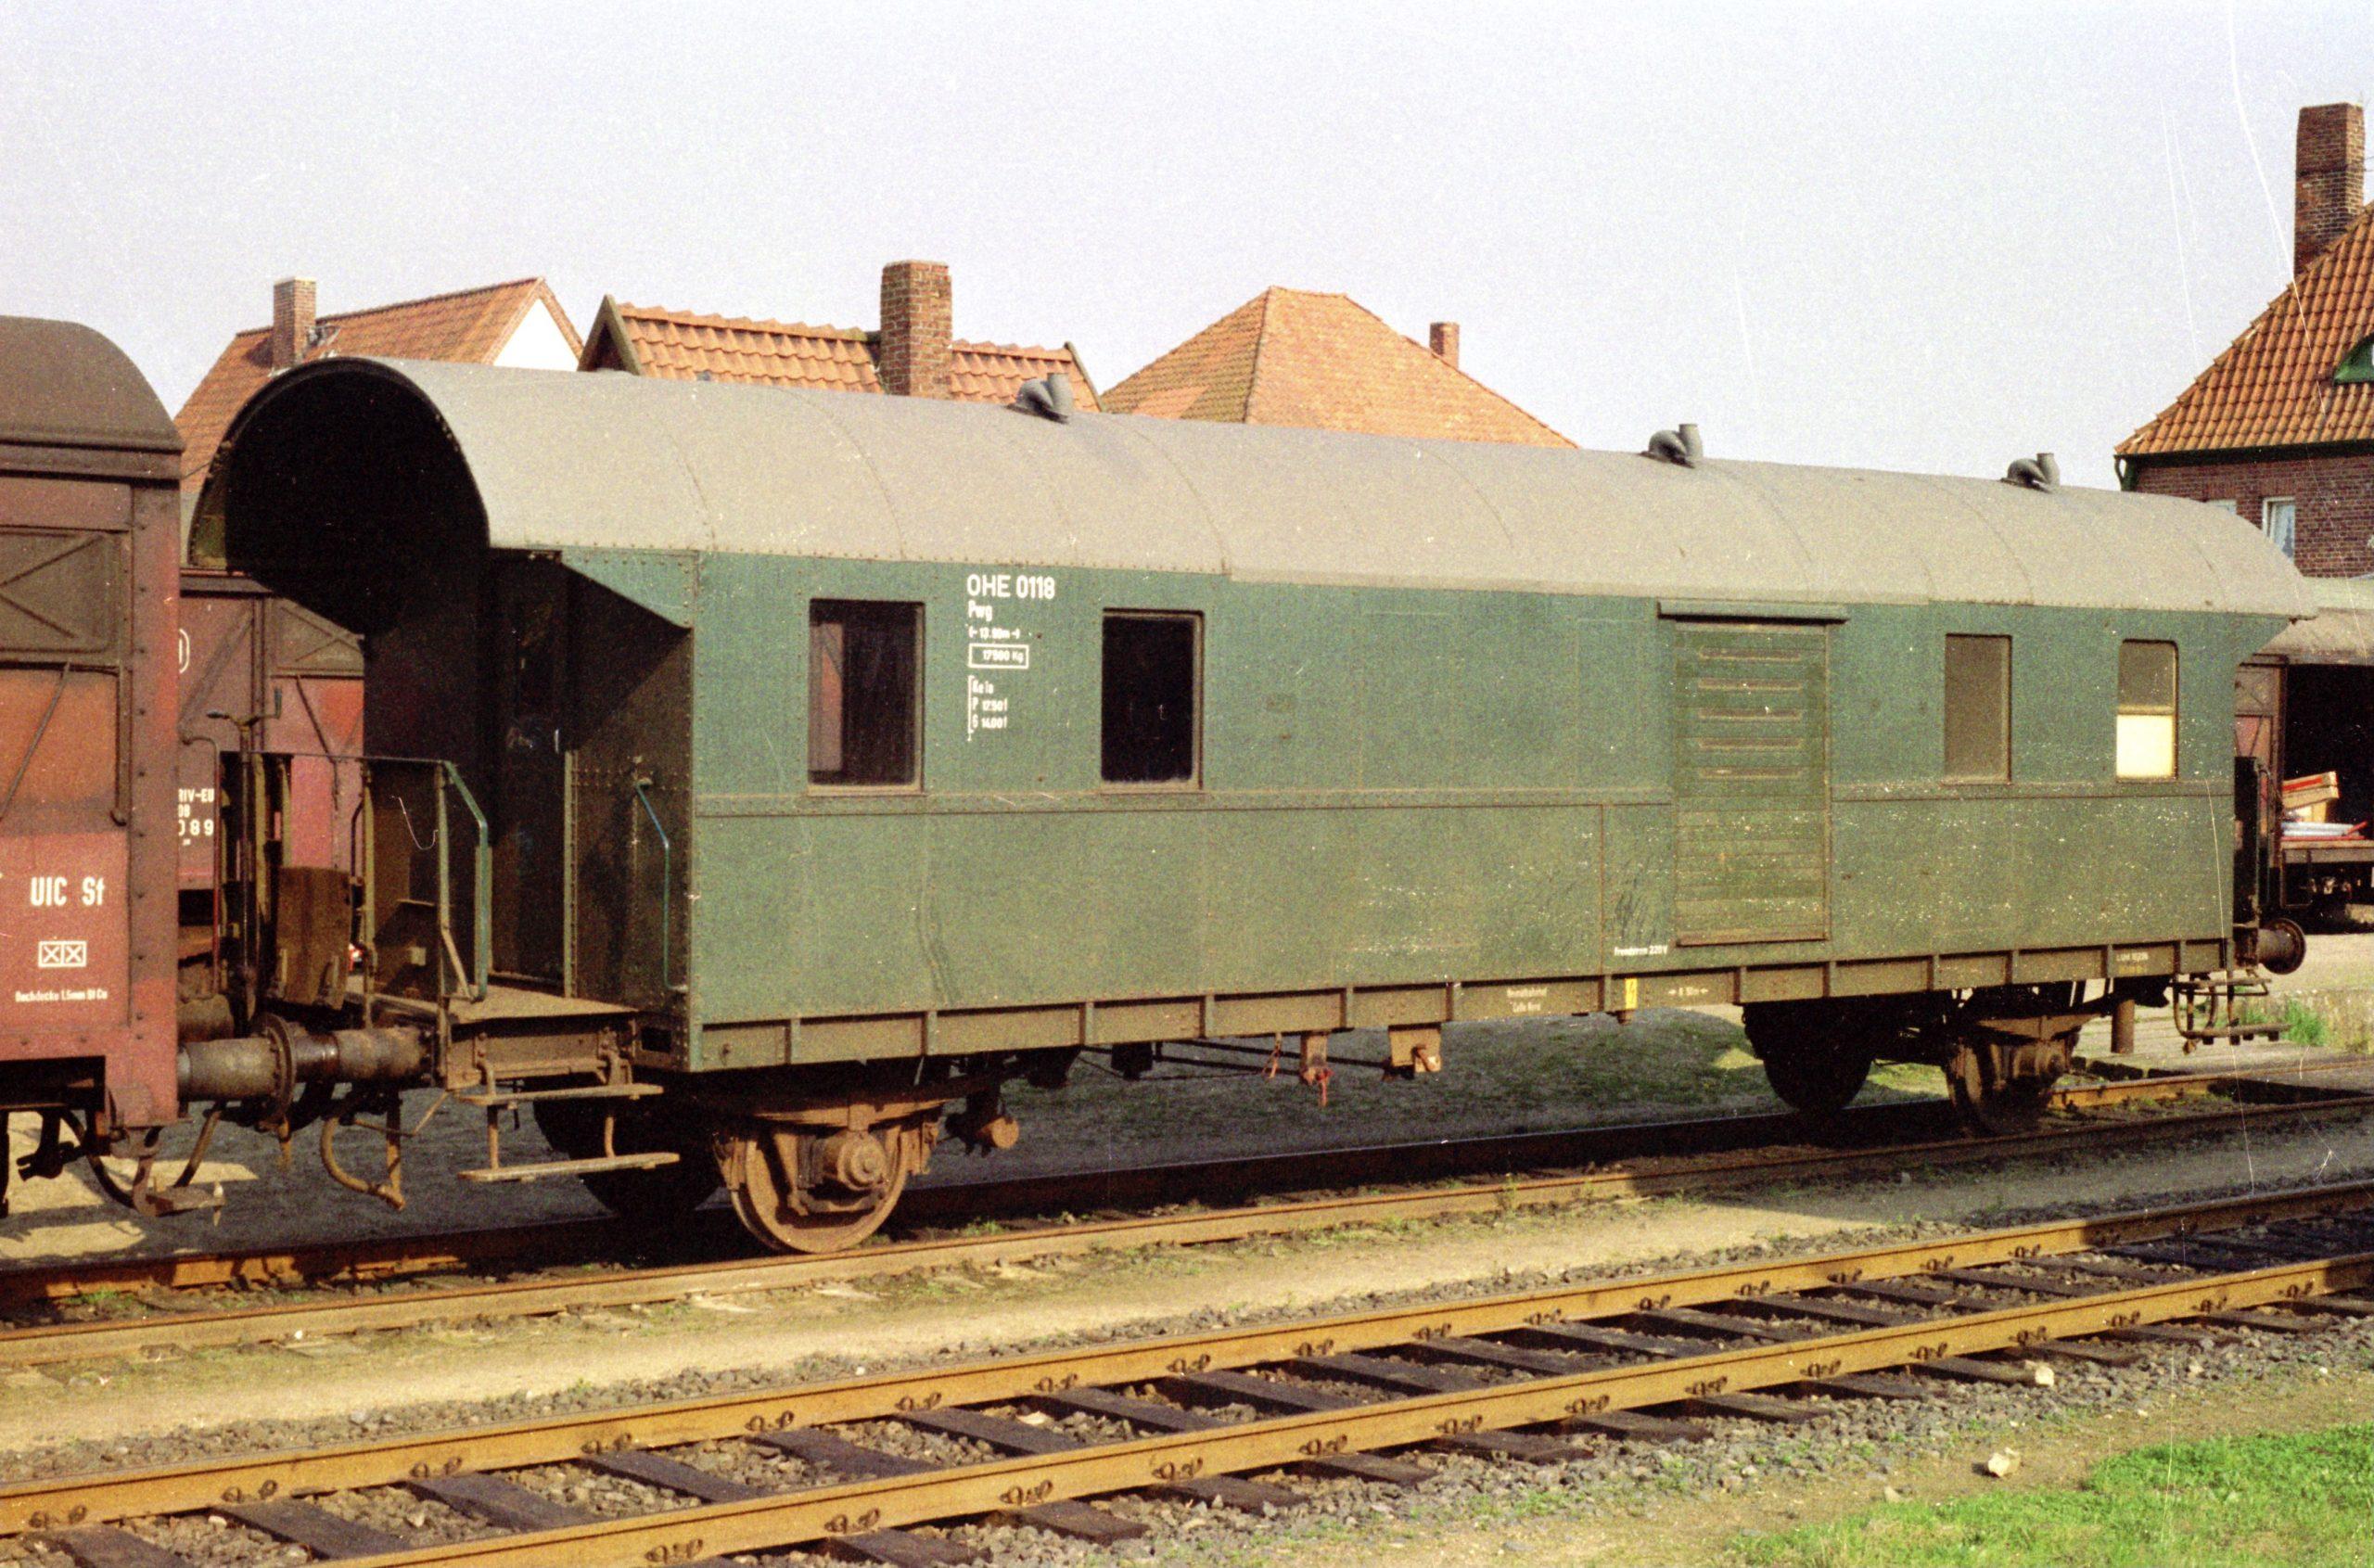 Packwagen 0118